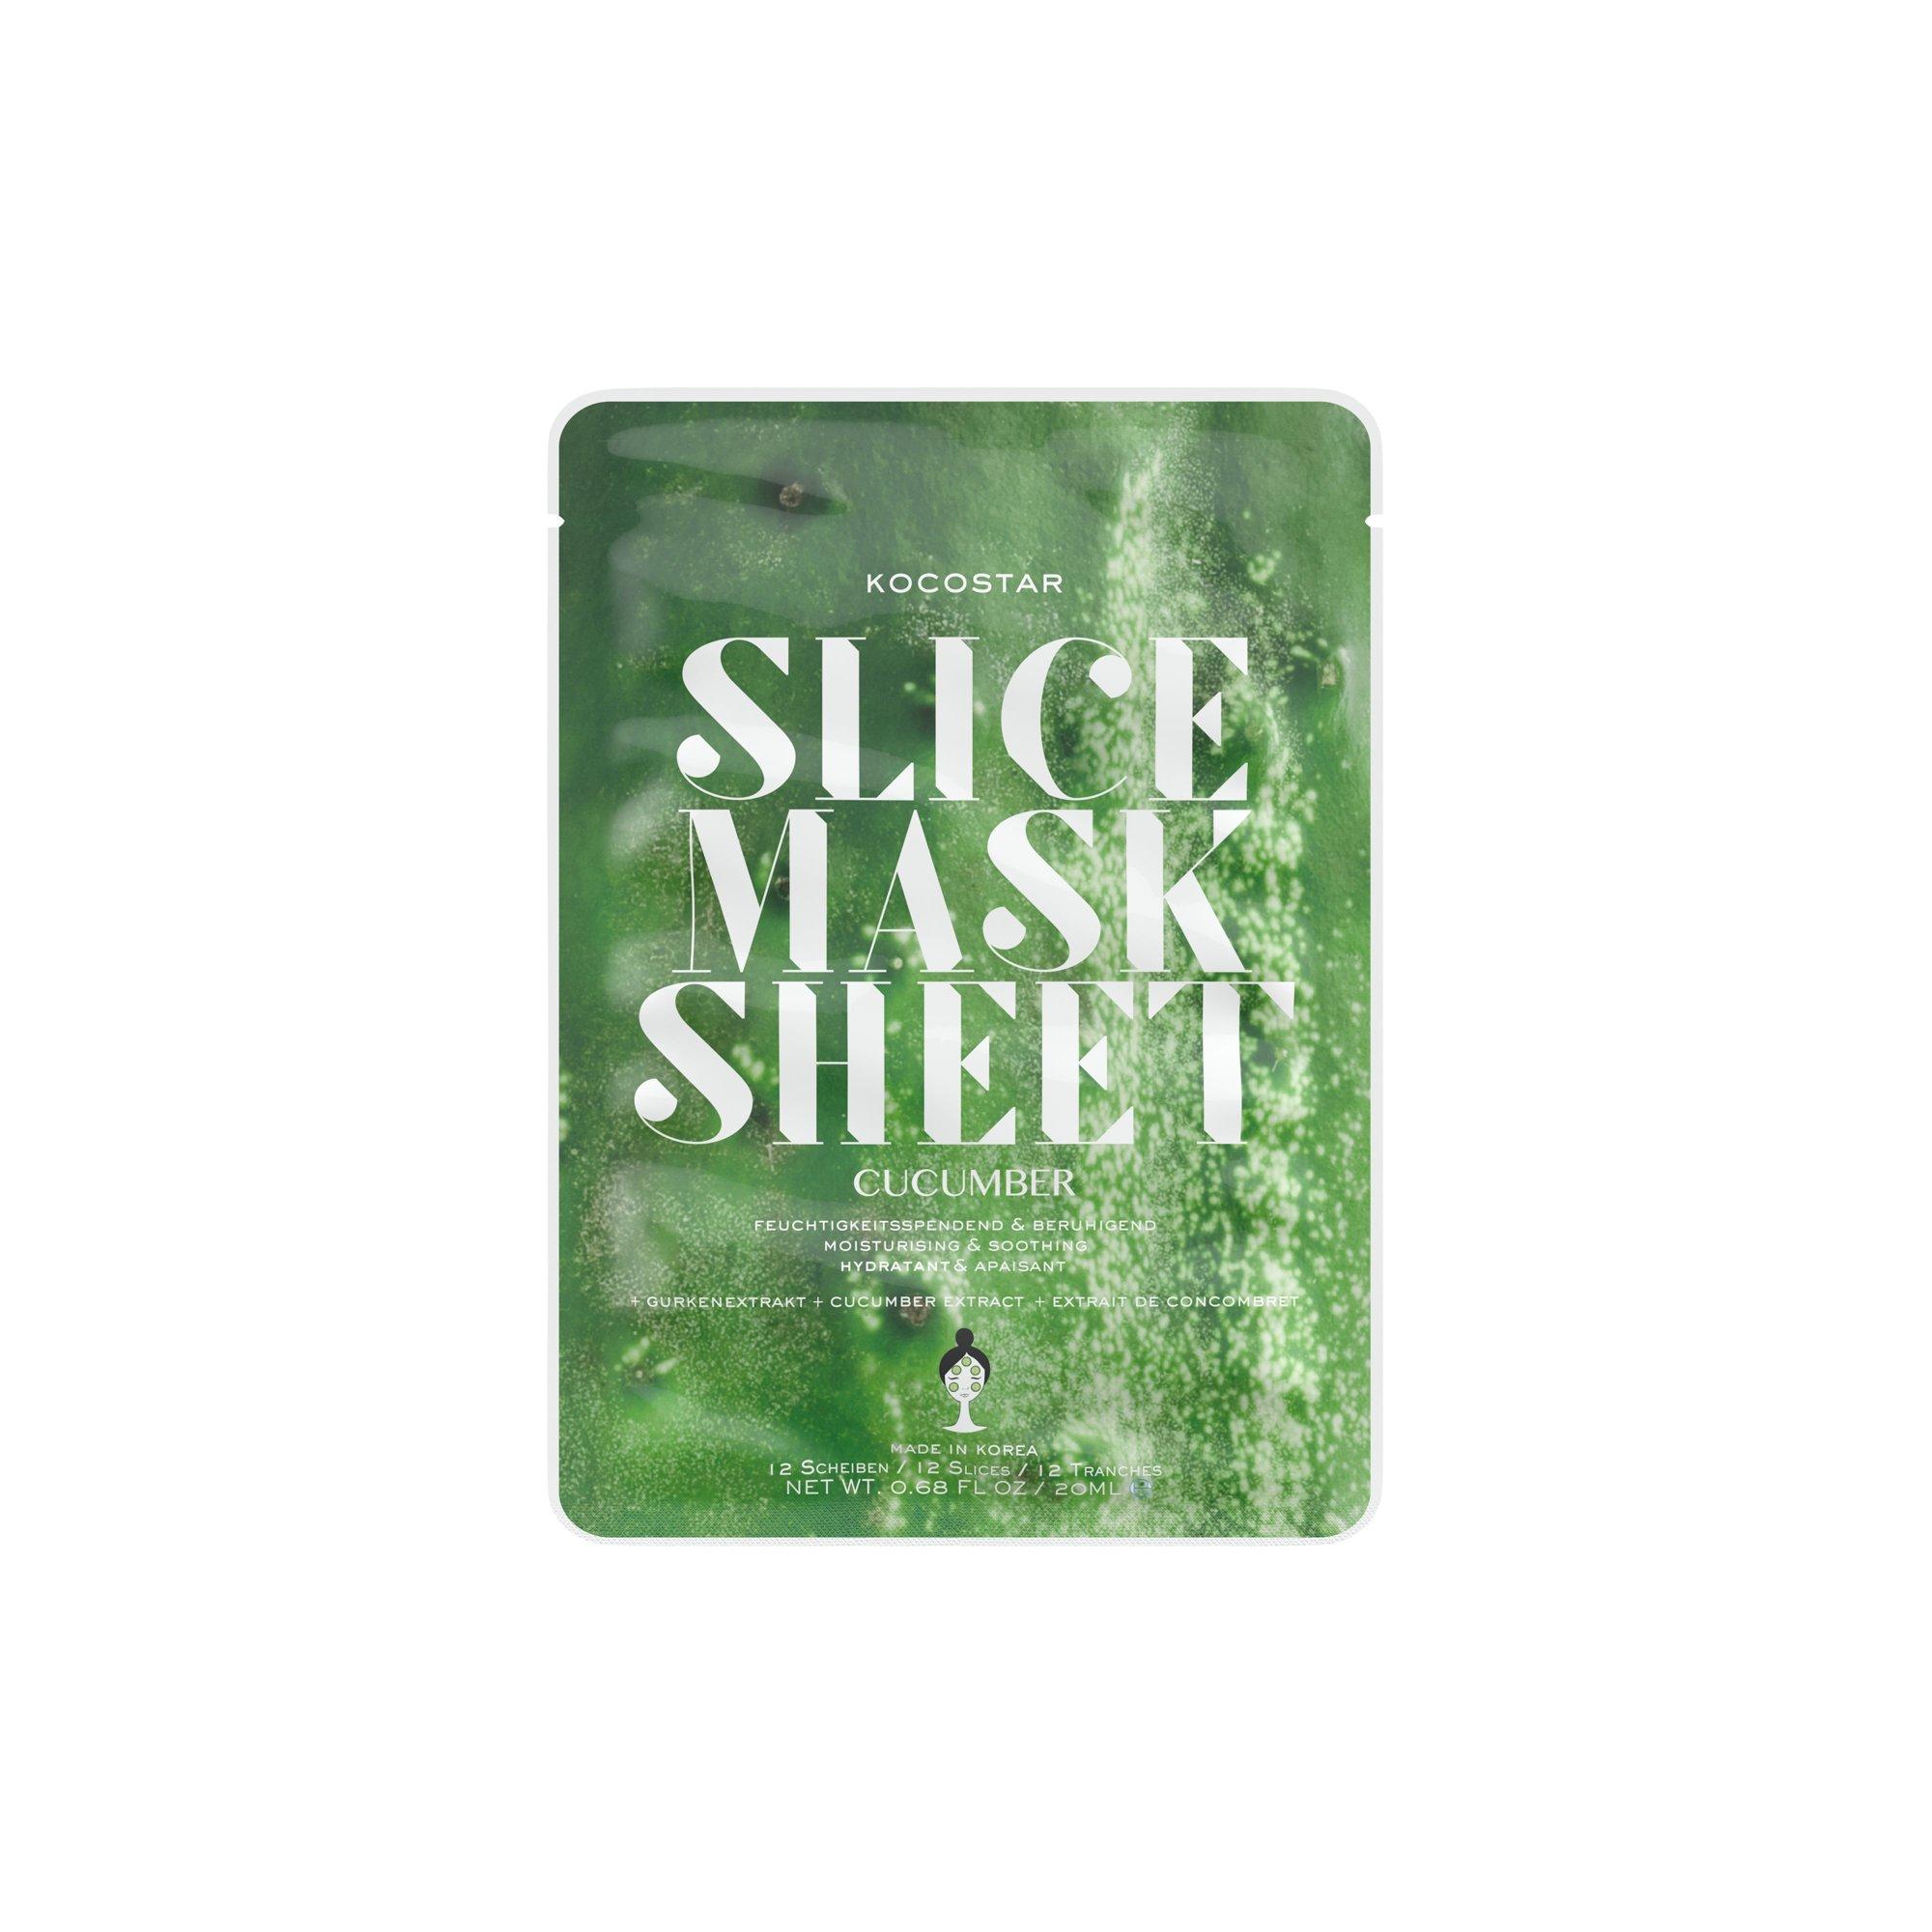 Kocostar Slice Mask Face Mask 20ml  Cucumber